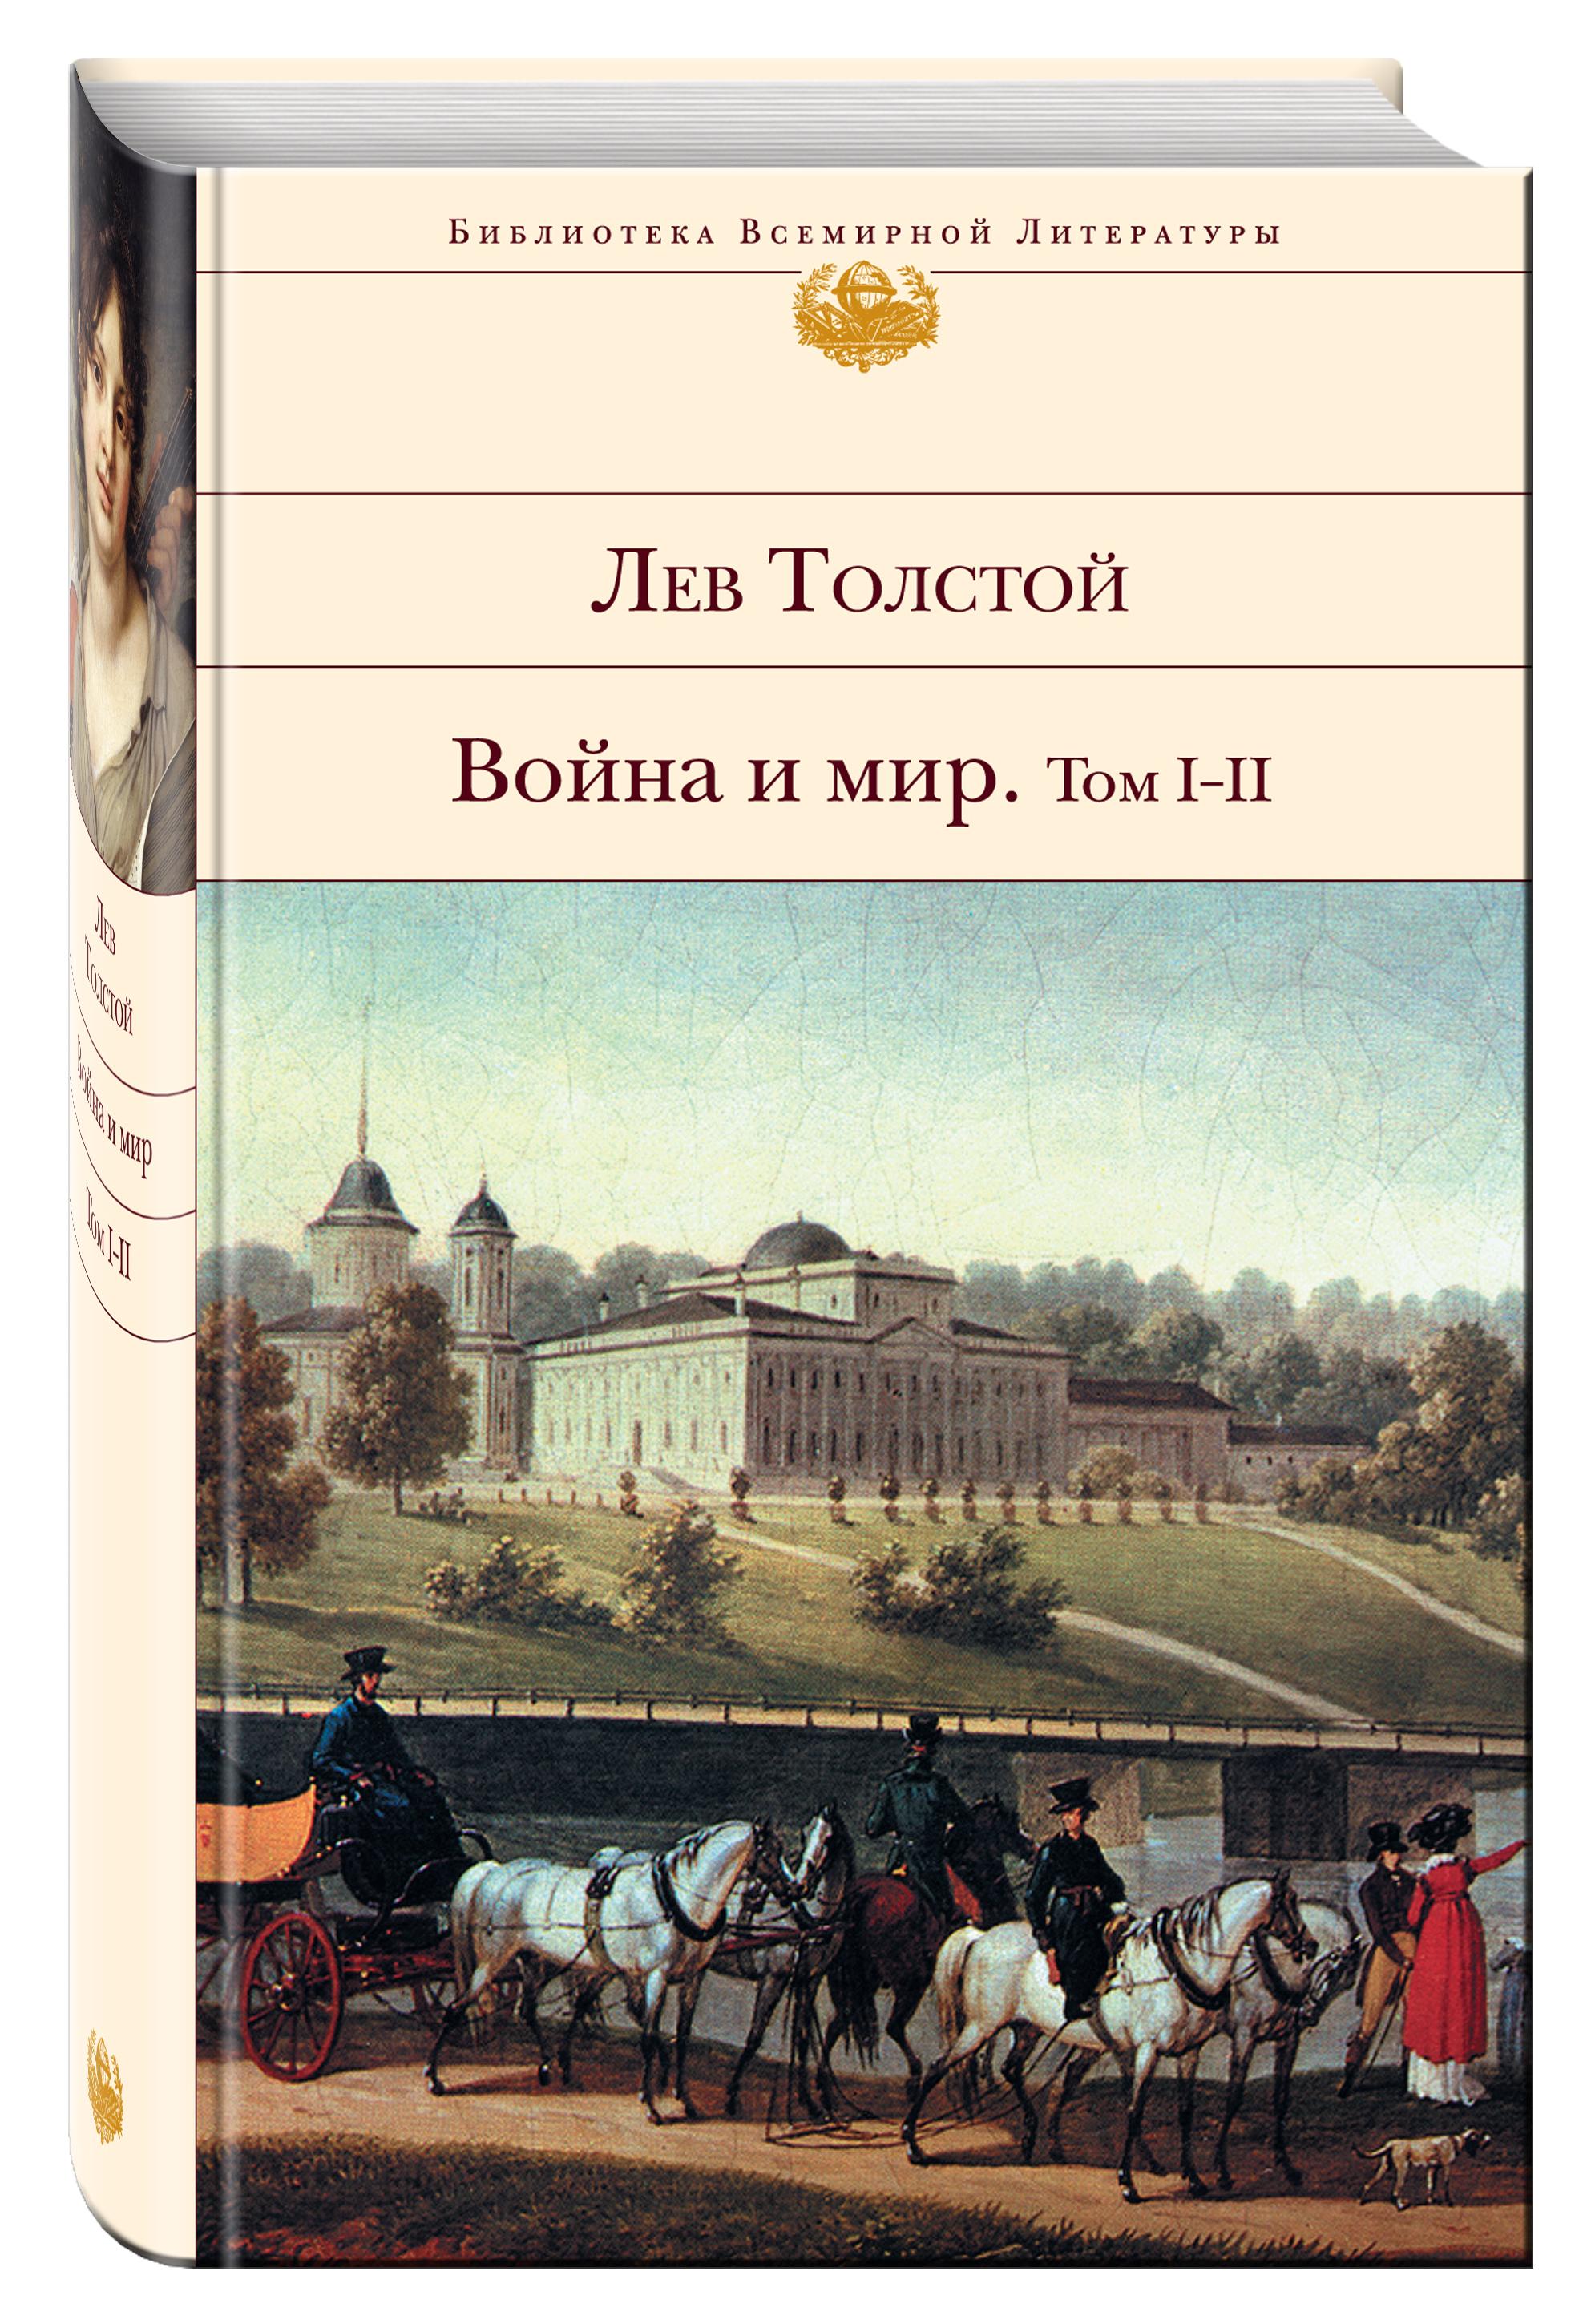 Толстой Л.Н. Война и мир. Том I-II книги эксмо война и мир том i ii